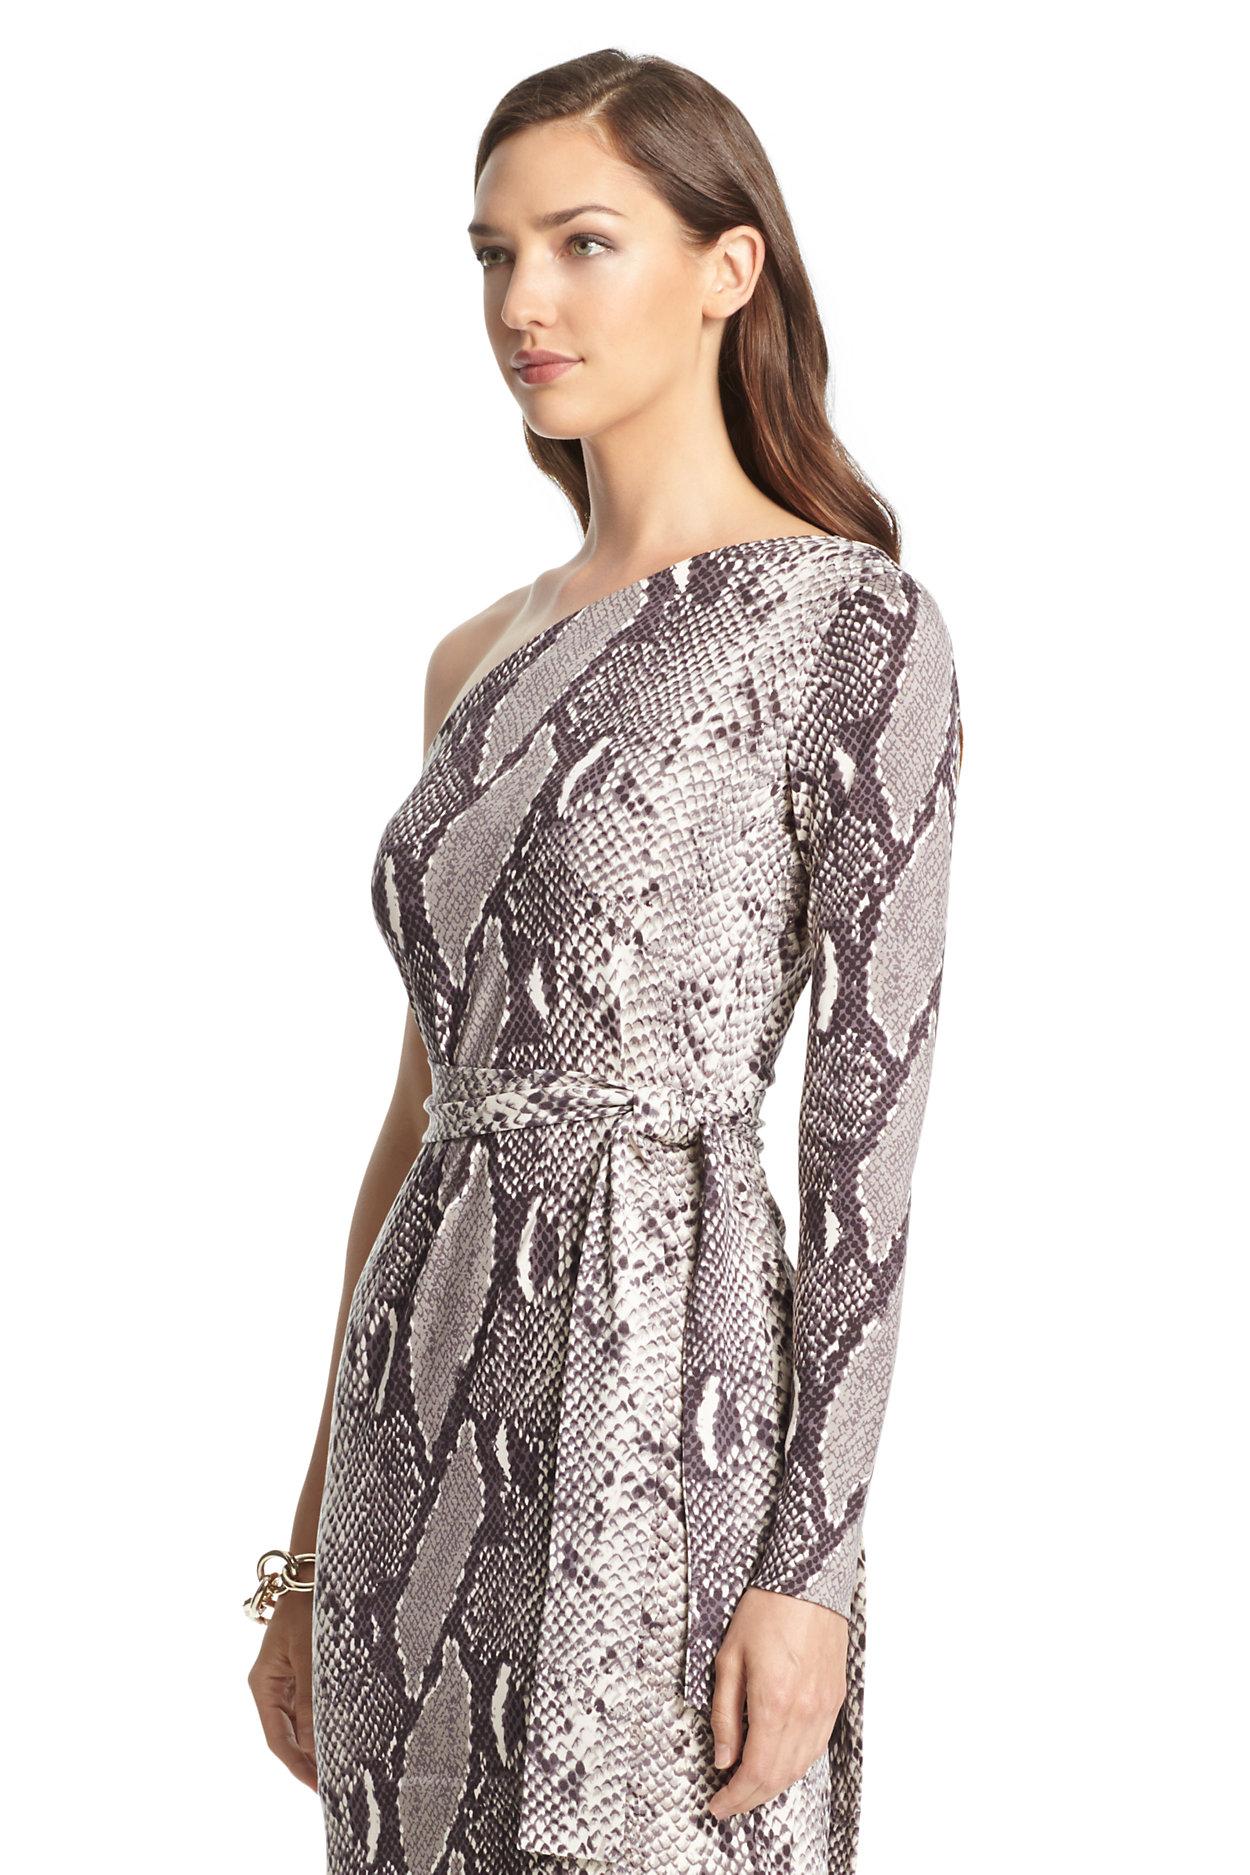 Coco Silk Jersey One Shoulder Mini Wrap Dress